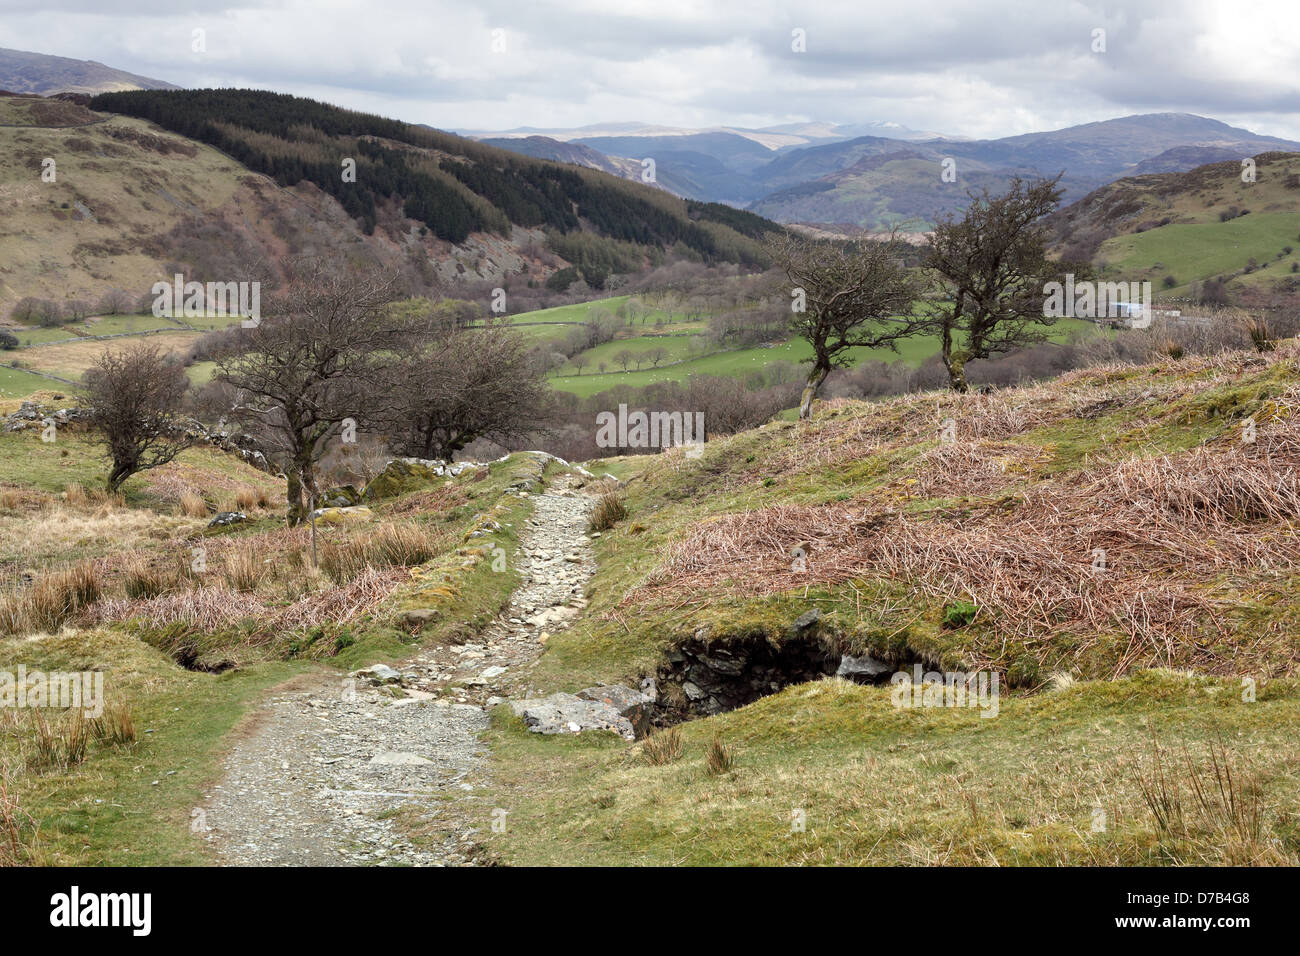 The route approaches the lake of llyn cau before. Der Pony Pfad Auf Cadair Idris In Snowdonia Nationalpark Gwynedd Wales April 2013 Stockfotografie Alamy